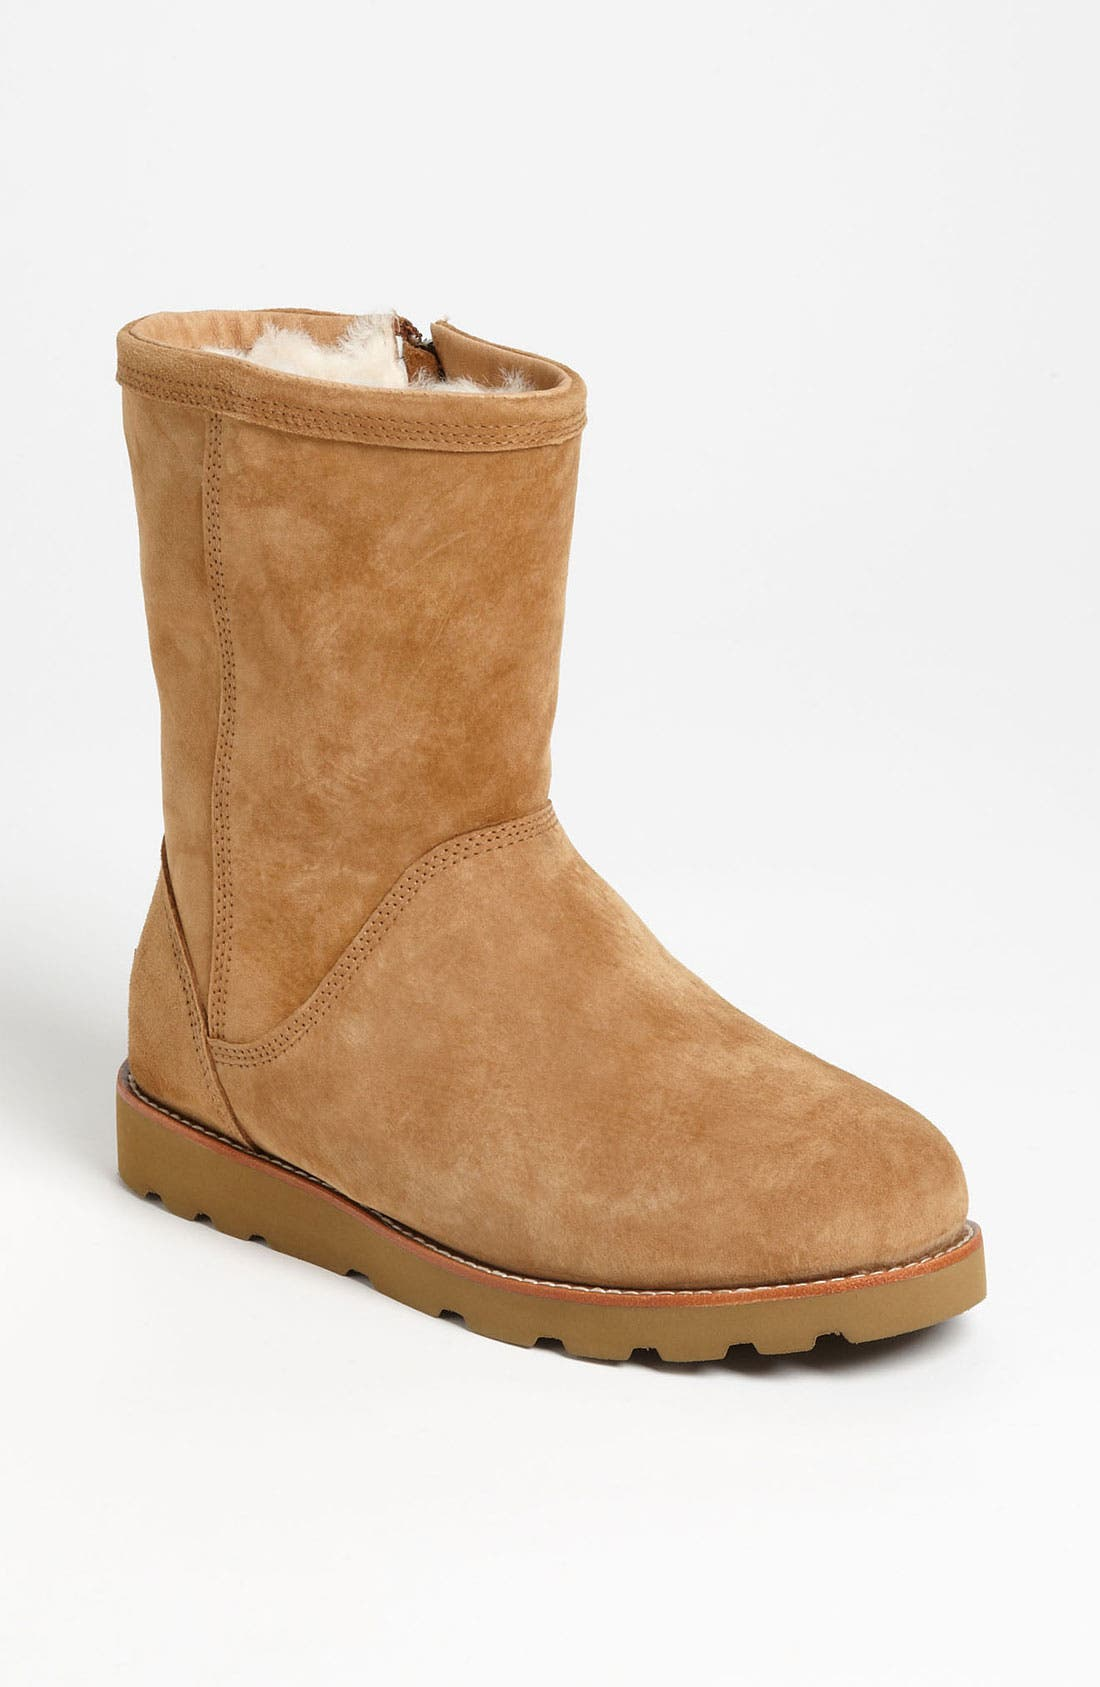 Alternate Image 1 Selected - UGG® Australia 'Selia' Boot (Women)